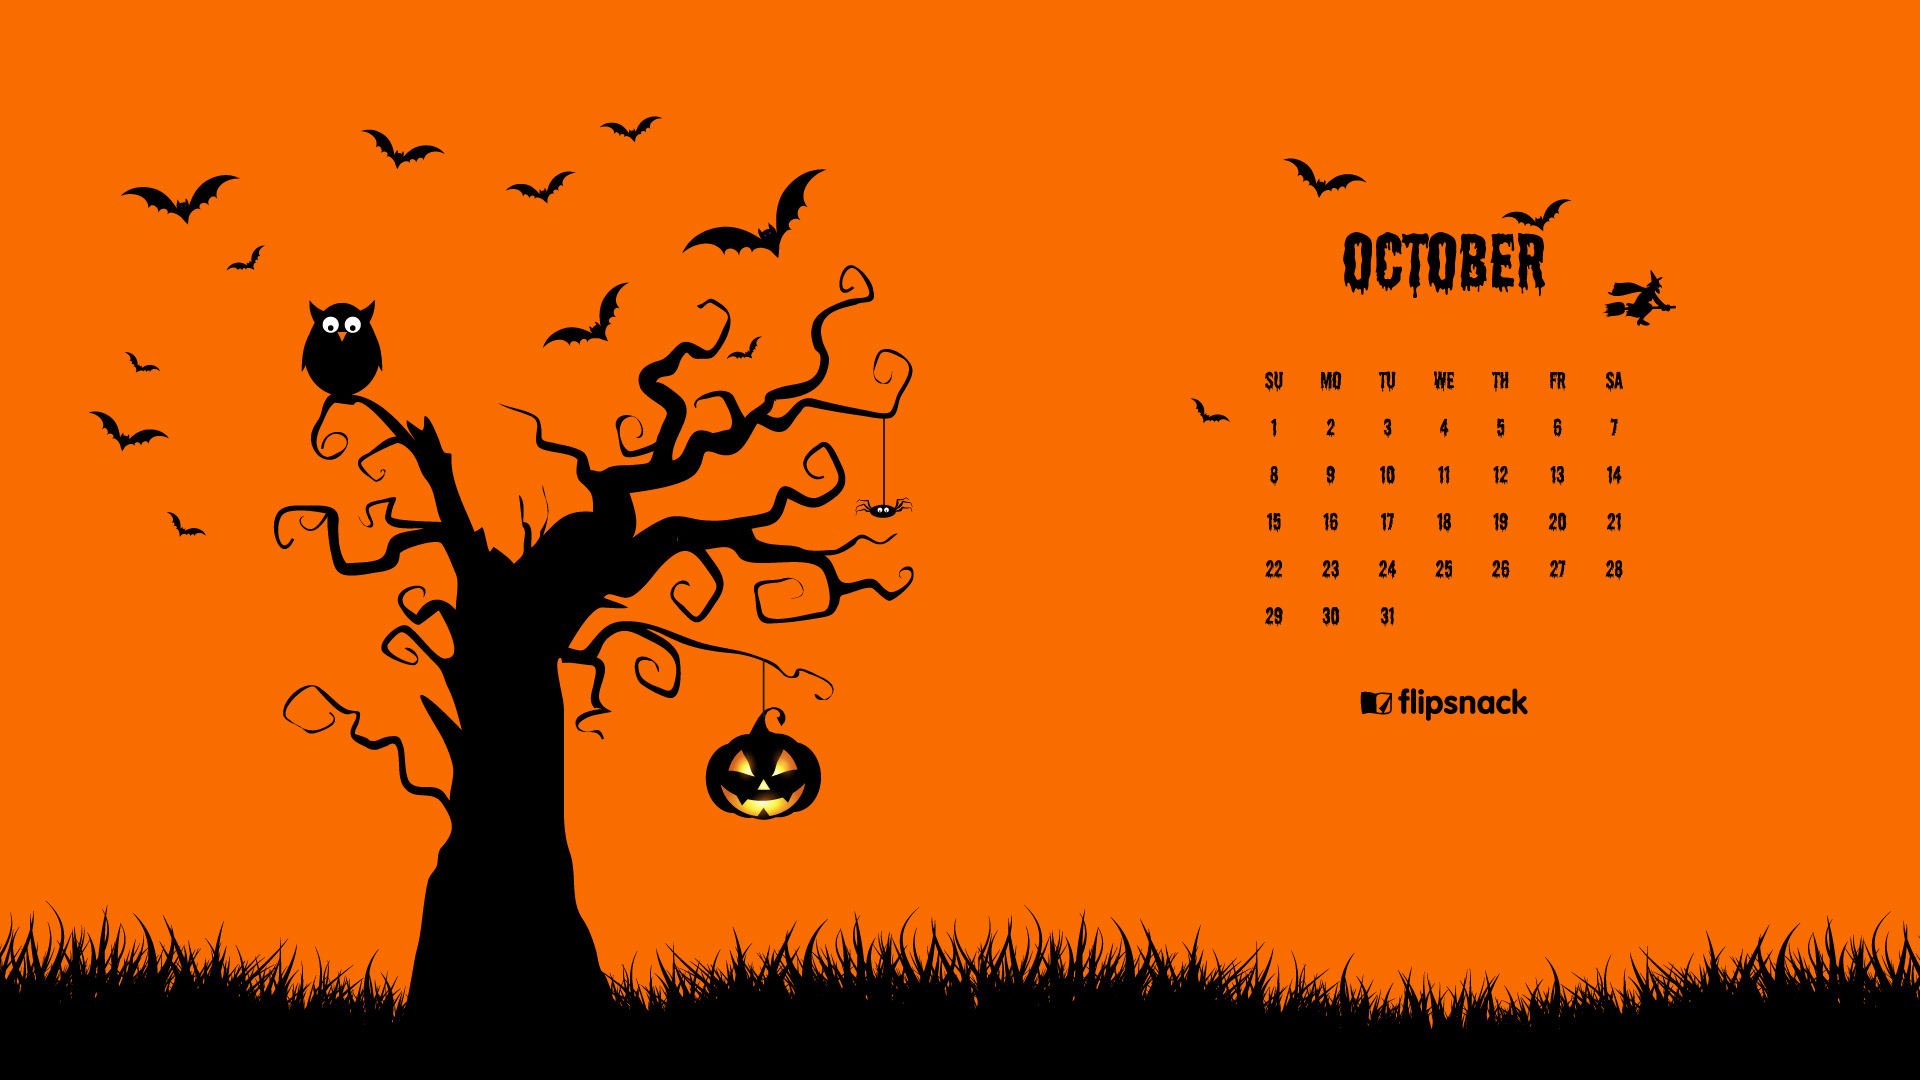 October 2017 calendar wallpaper for desktop background 1920x1080